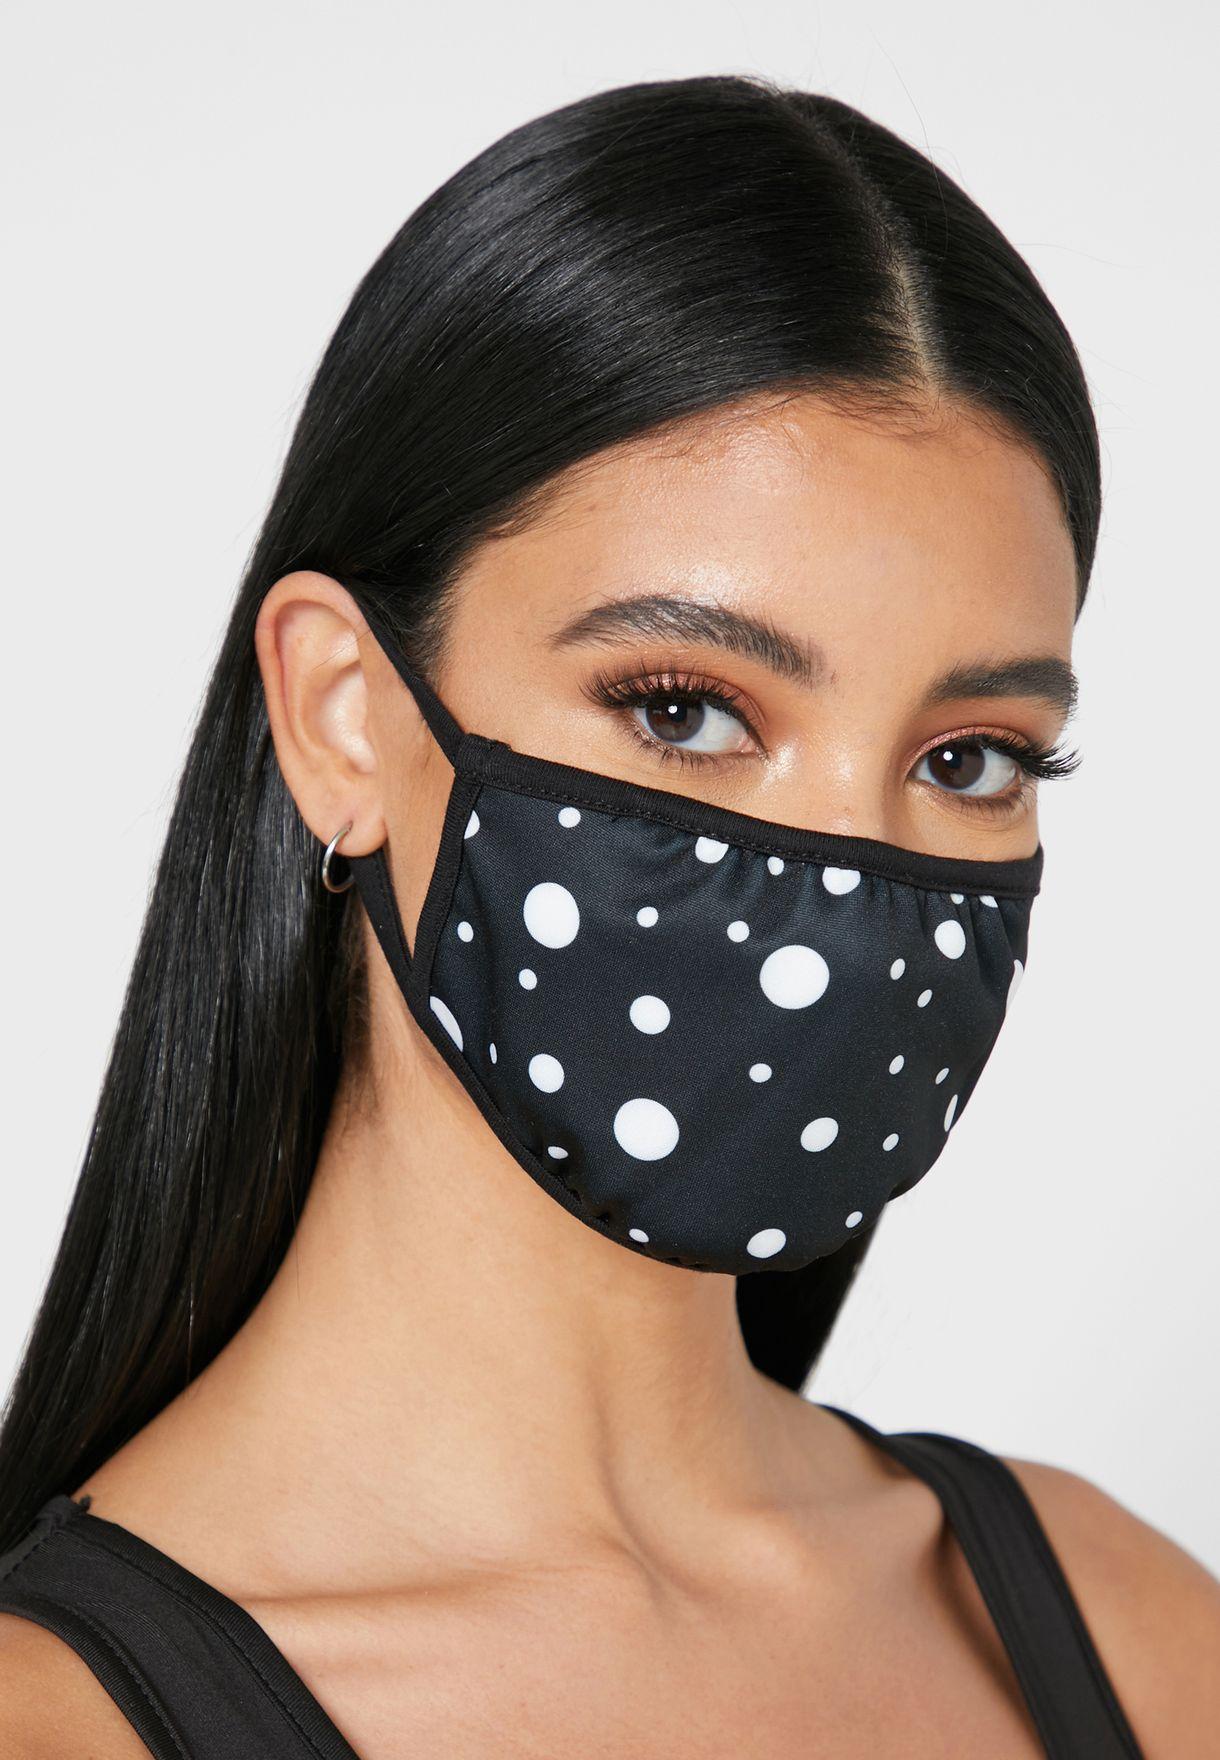 Mix Polka Dot Mask